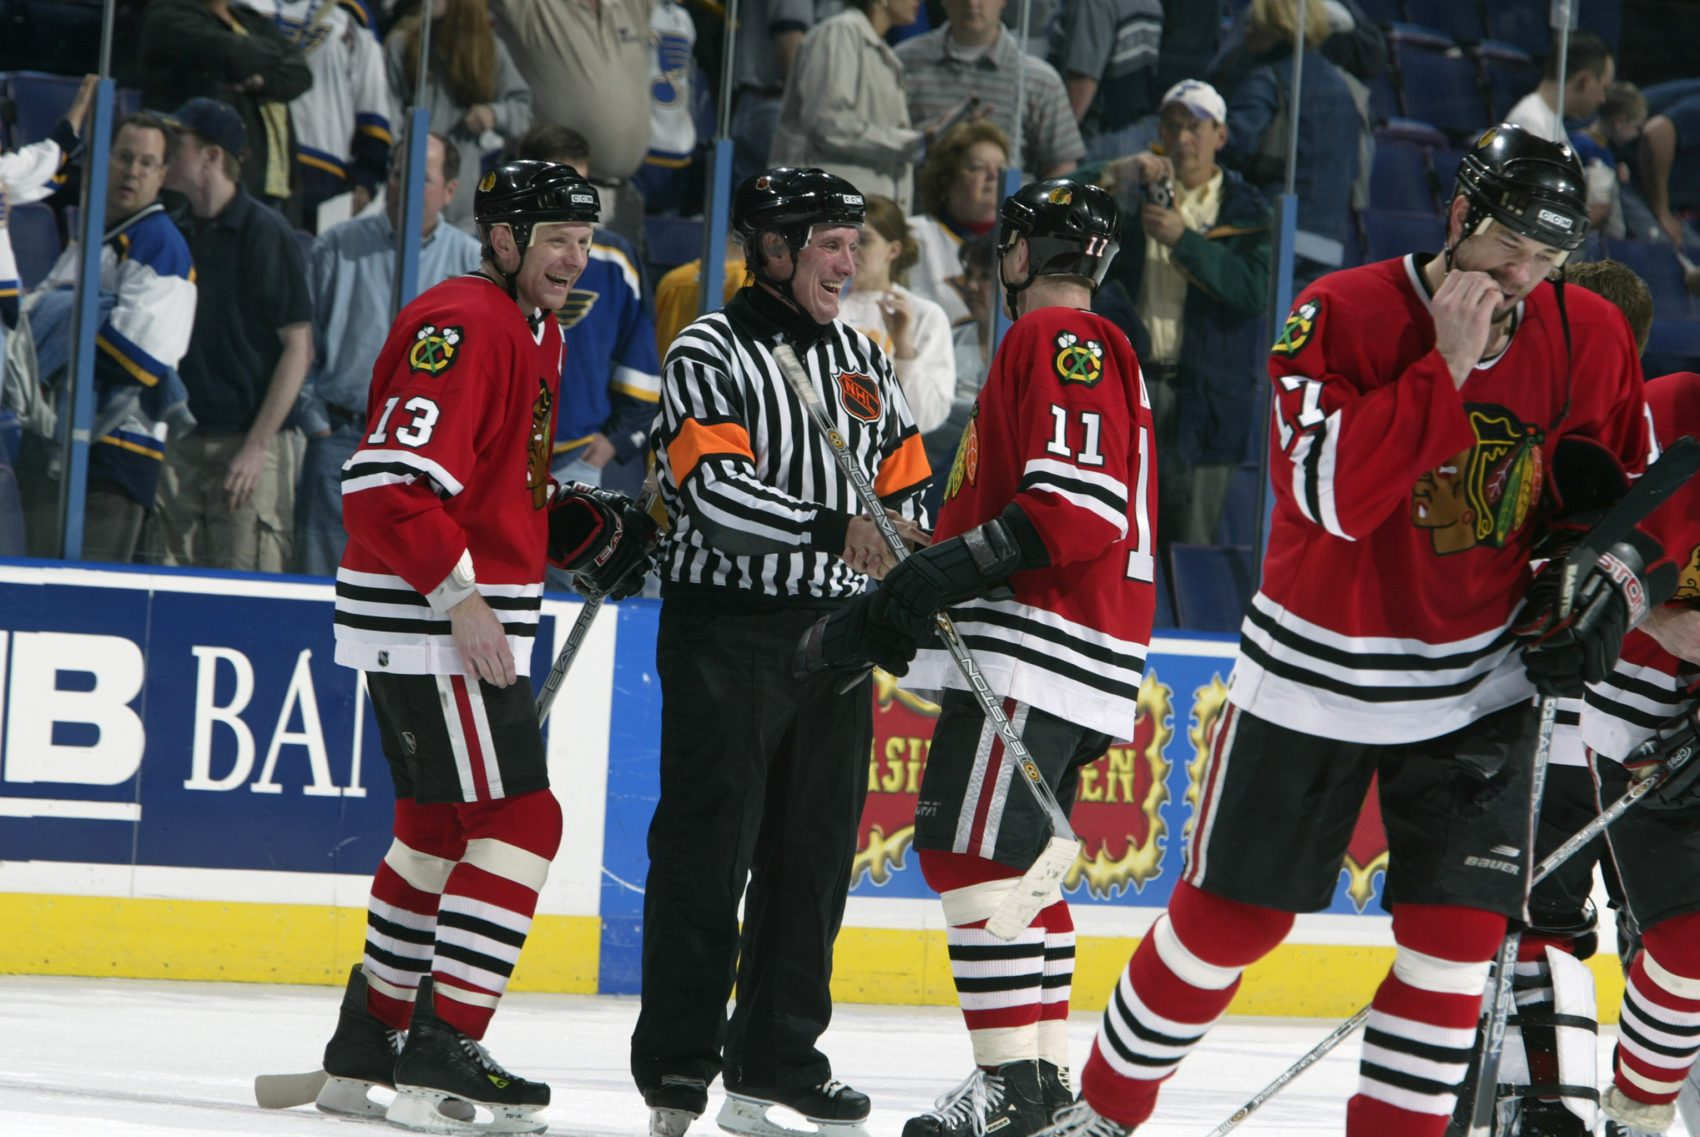 In 2003, Paul Stewart officiated his 1,000th career NHL game. (Elsa/Getty Images/NHLI)